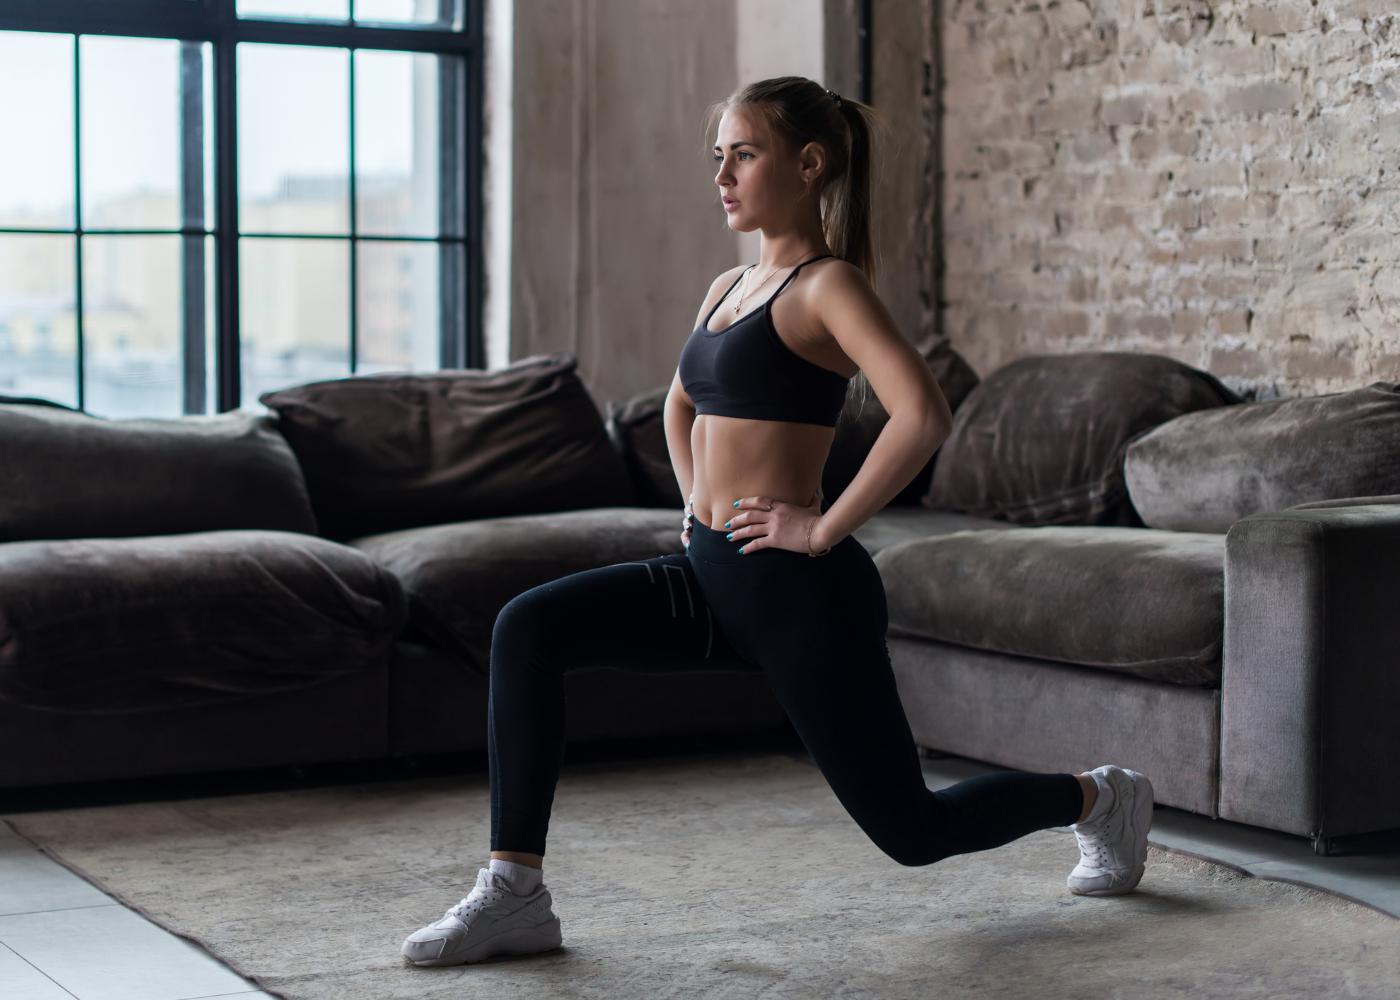 exercicios de crossfit para emagrecer lunges